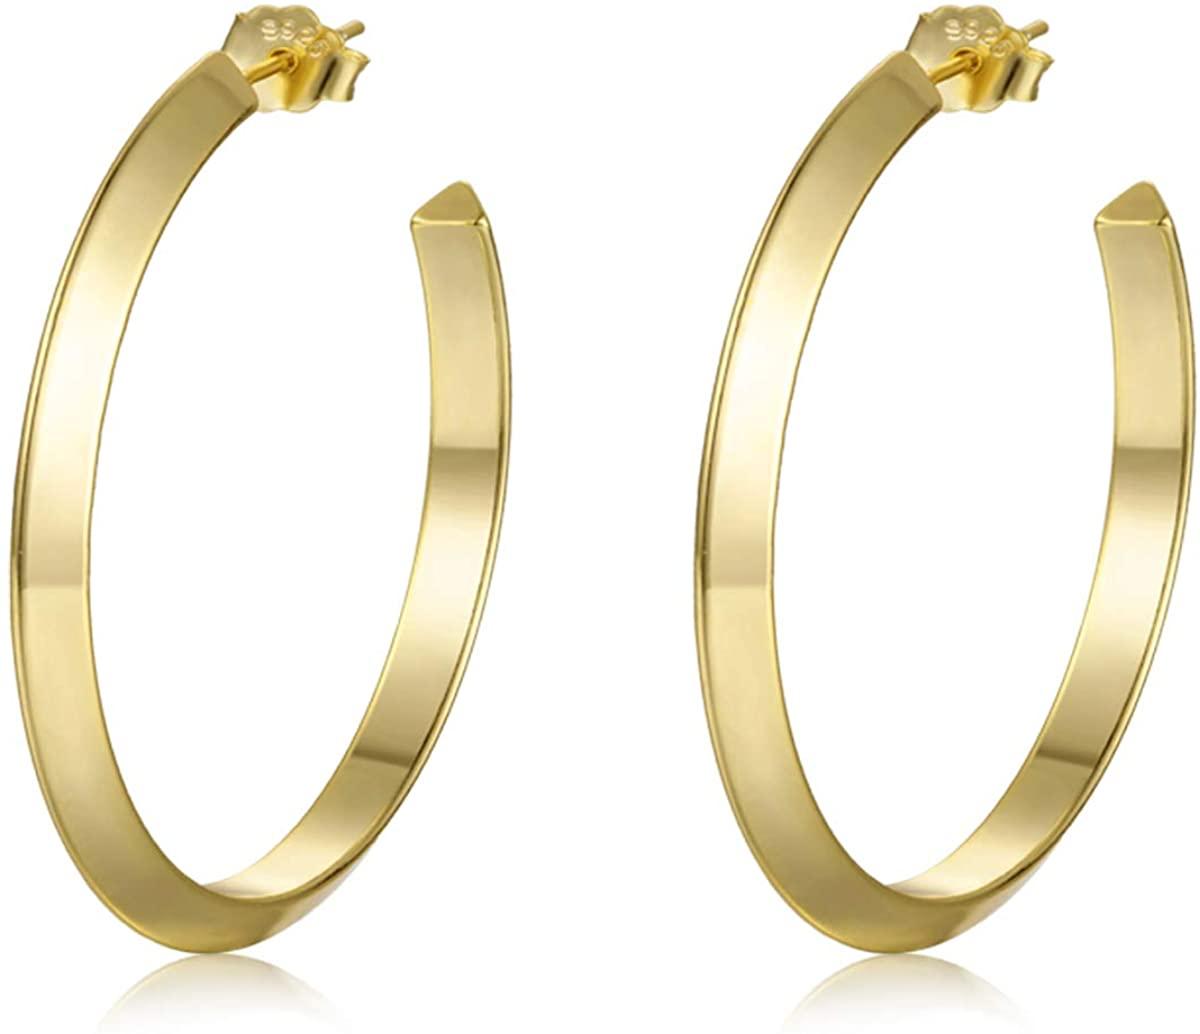 LYTOPTOP Open Round Big Hoop Earrings for Women Hypoallergenic 925 Sterling Silver Post